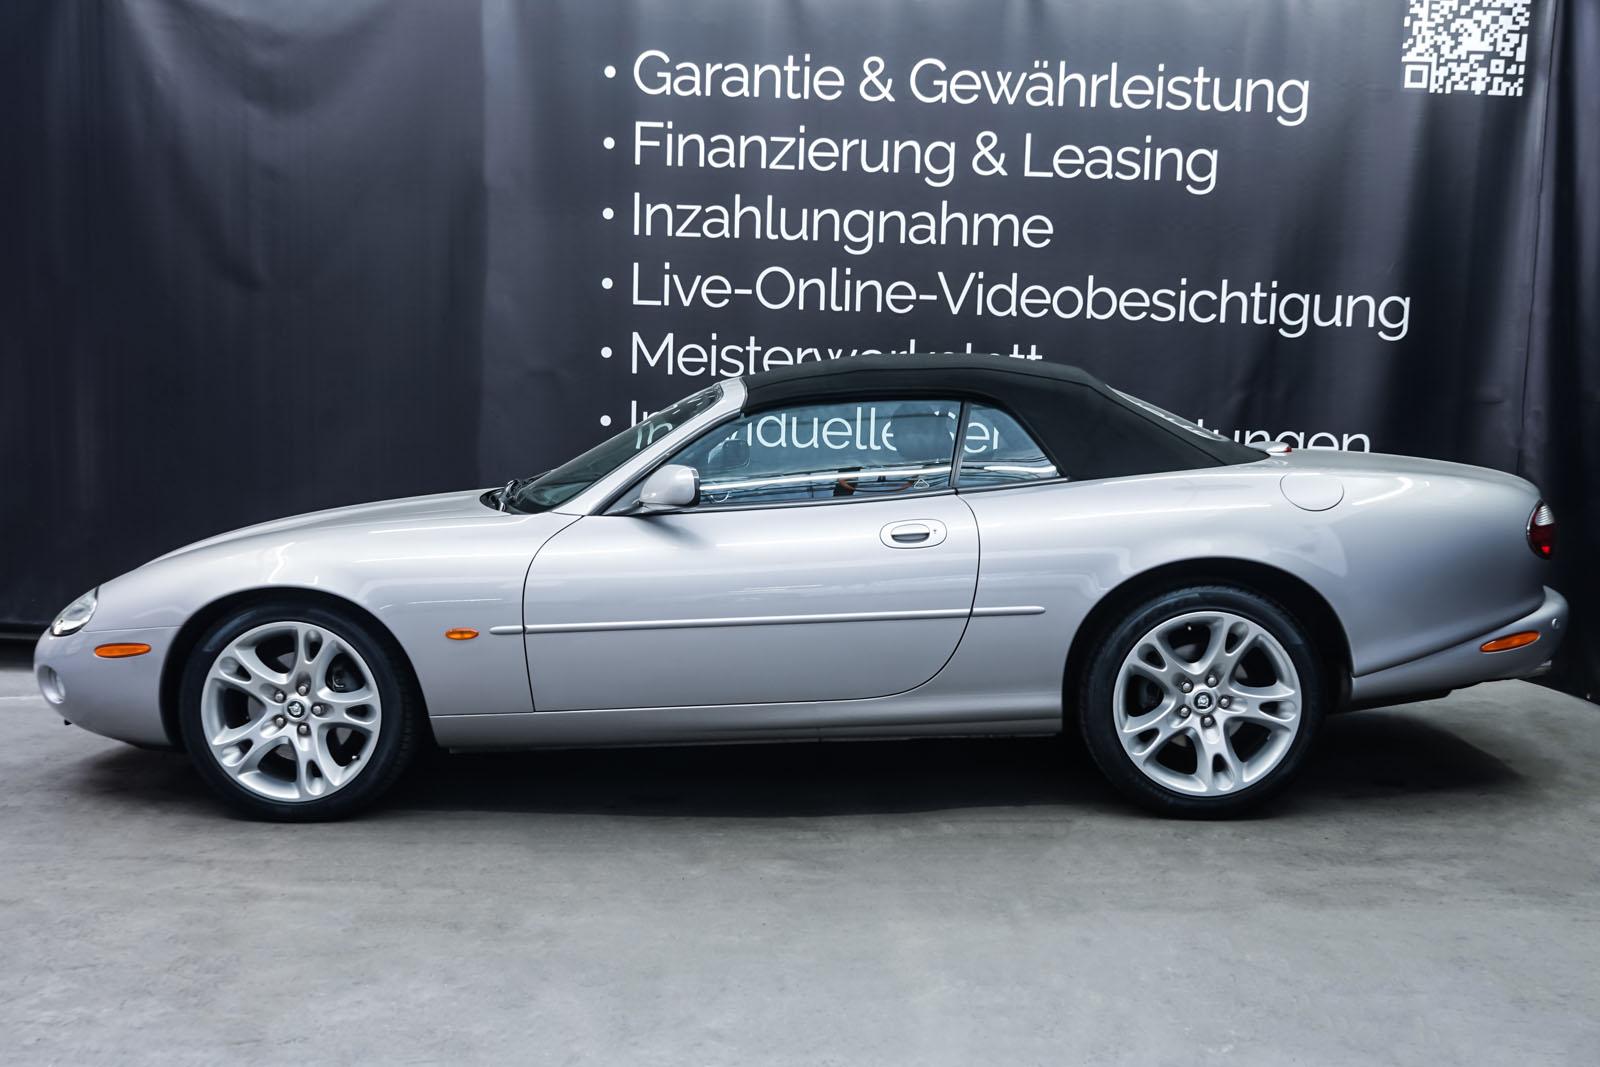 Jaguar_XK8_4.0_Silber_Schwarz_JAG-9731_5_w